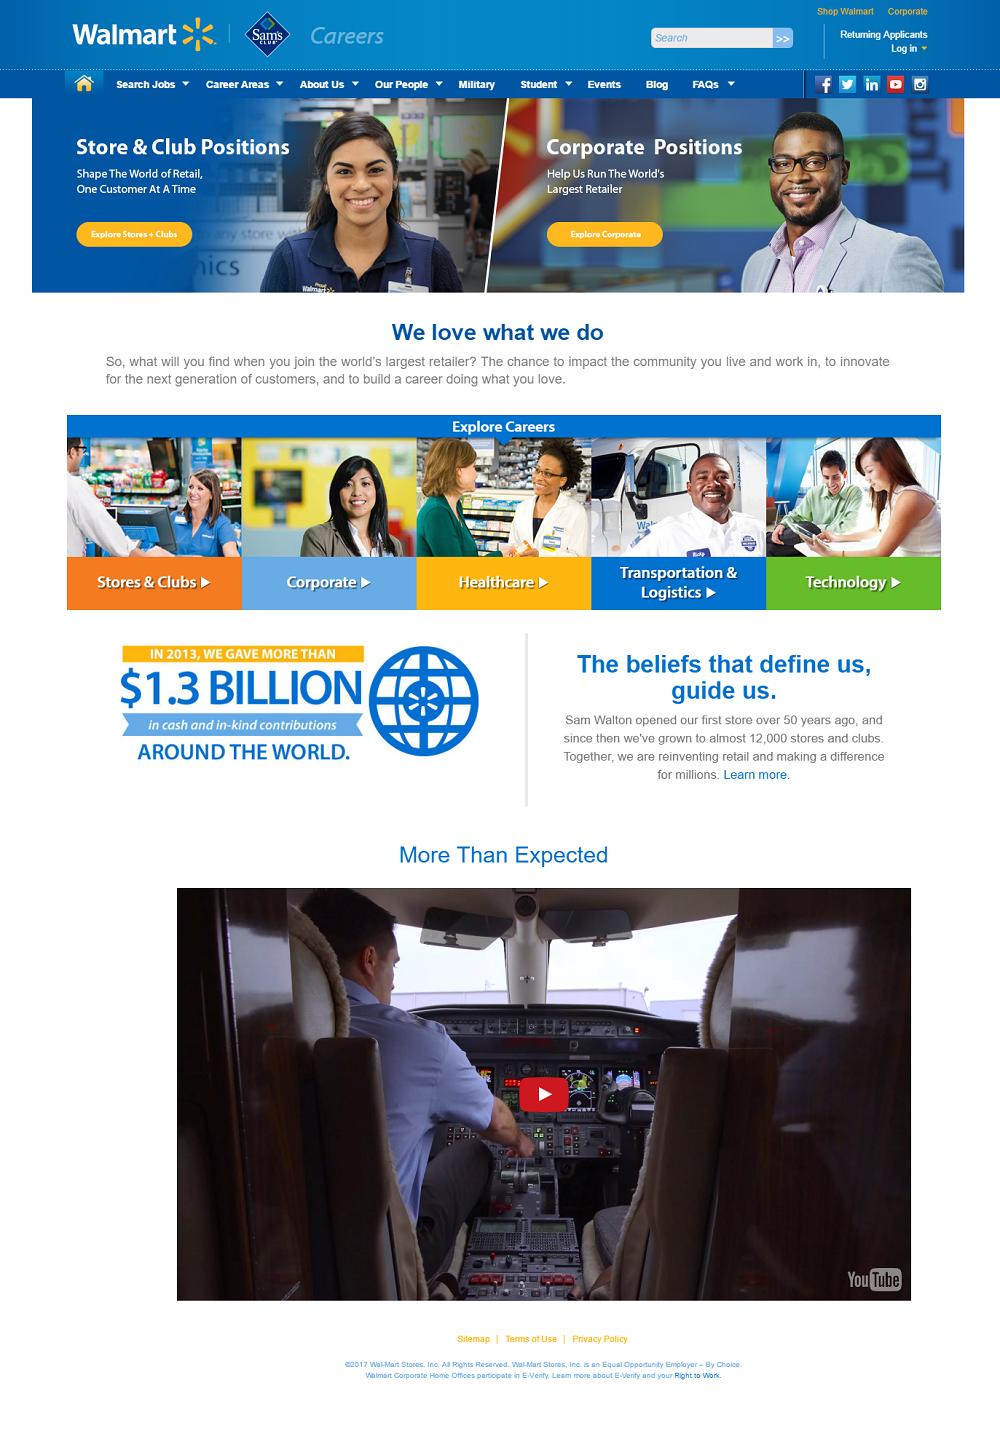 Best Company Career Sites Walmart - Ongig Blog